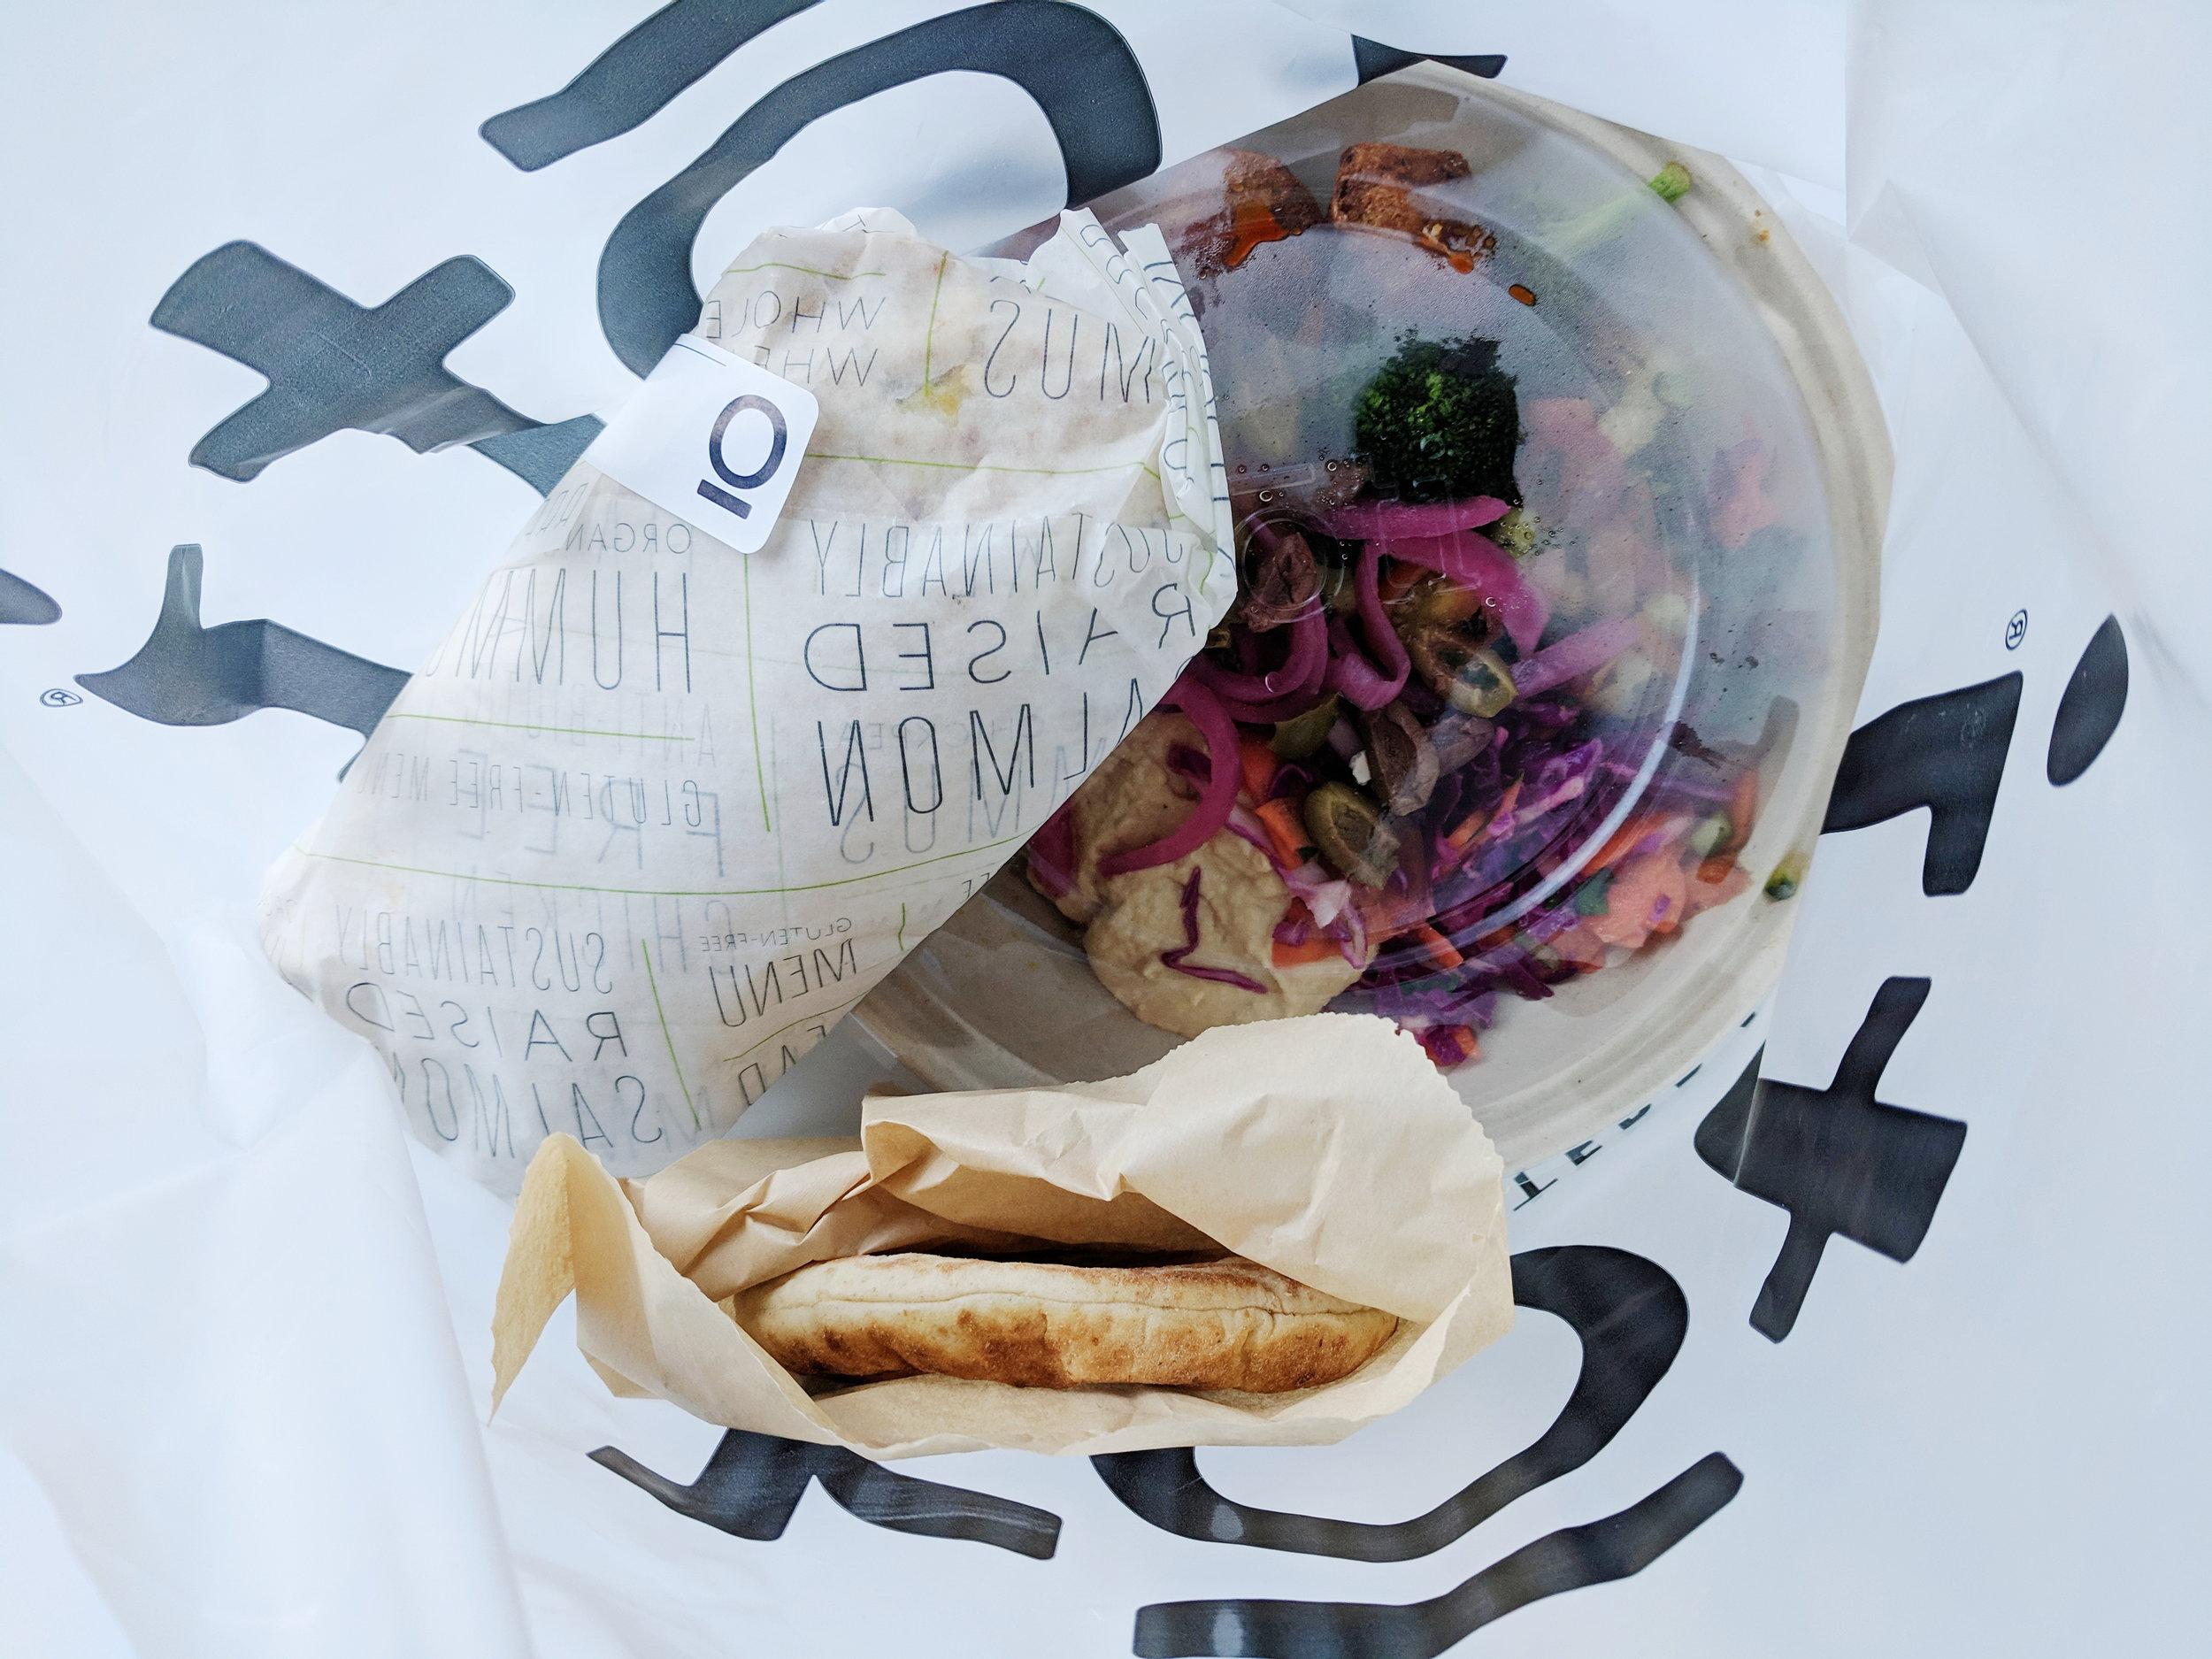 Vegan_Roti Mediterranean_Nutritious Vida